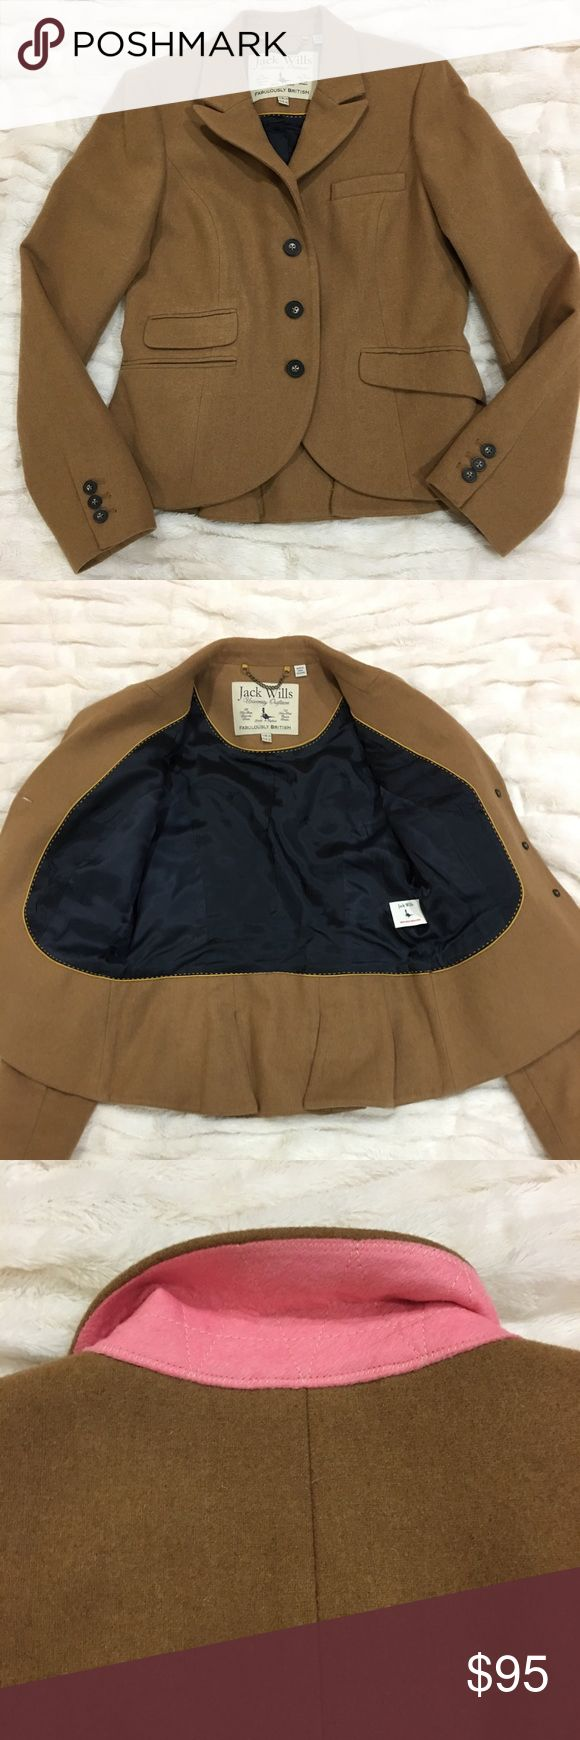 Jack wills blazer jacket size 10 Gorges jack wills blazer size 10 Jack Wills Jackets & Coats Blazers